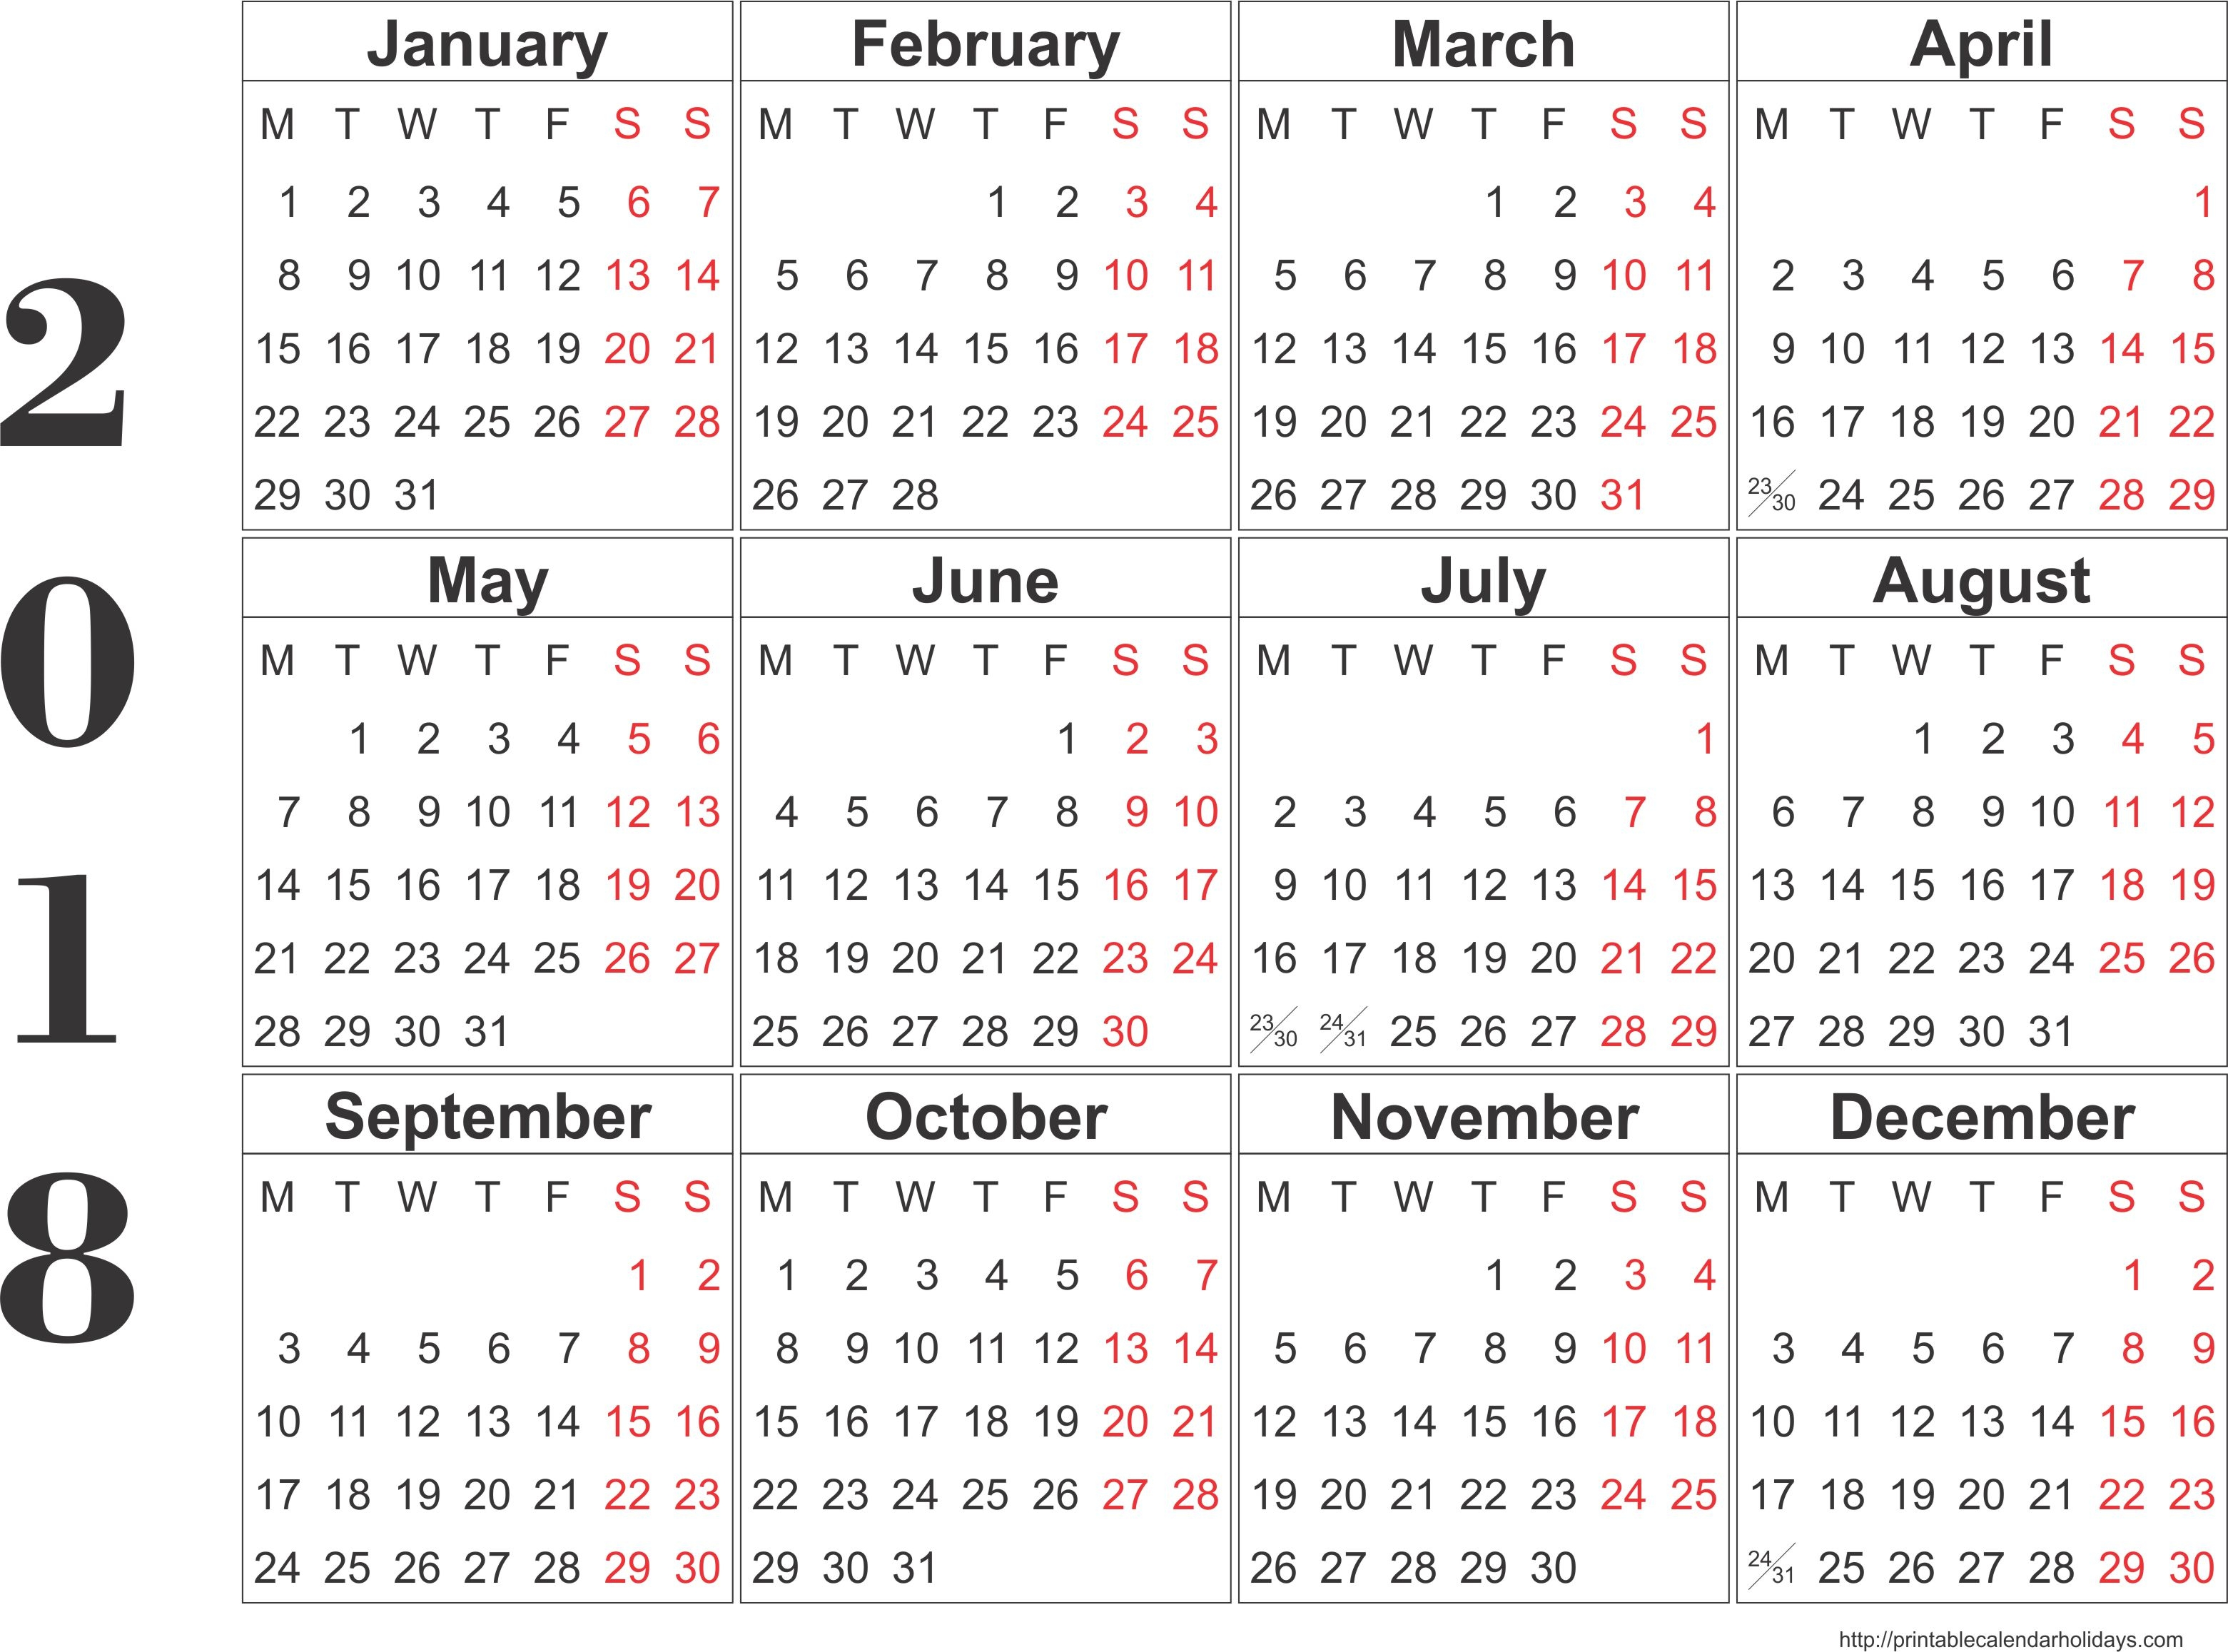 monthly calendar bitcoinrushtk Free Printable 2018 Calendar By Month erdferdf